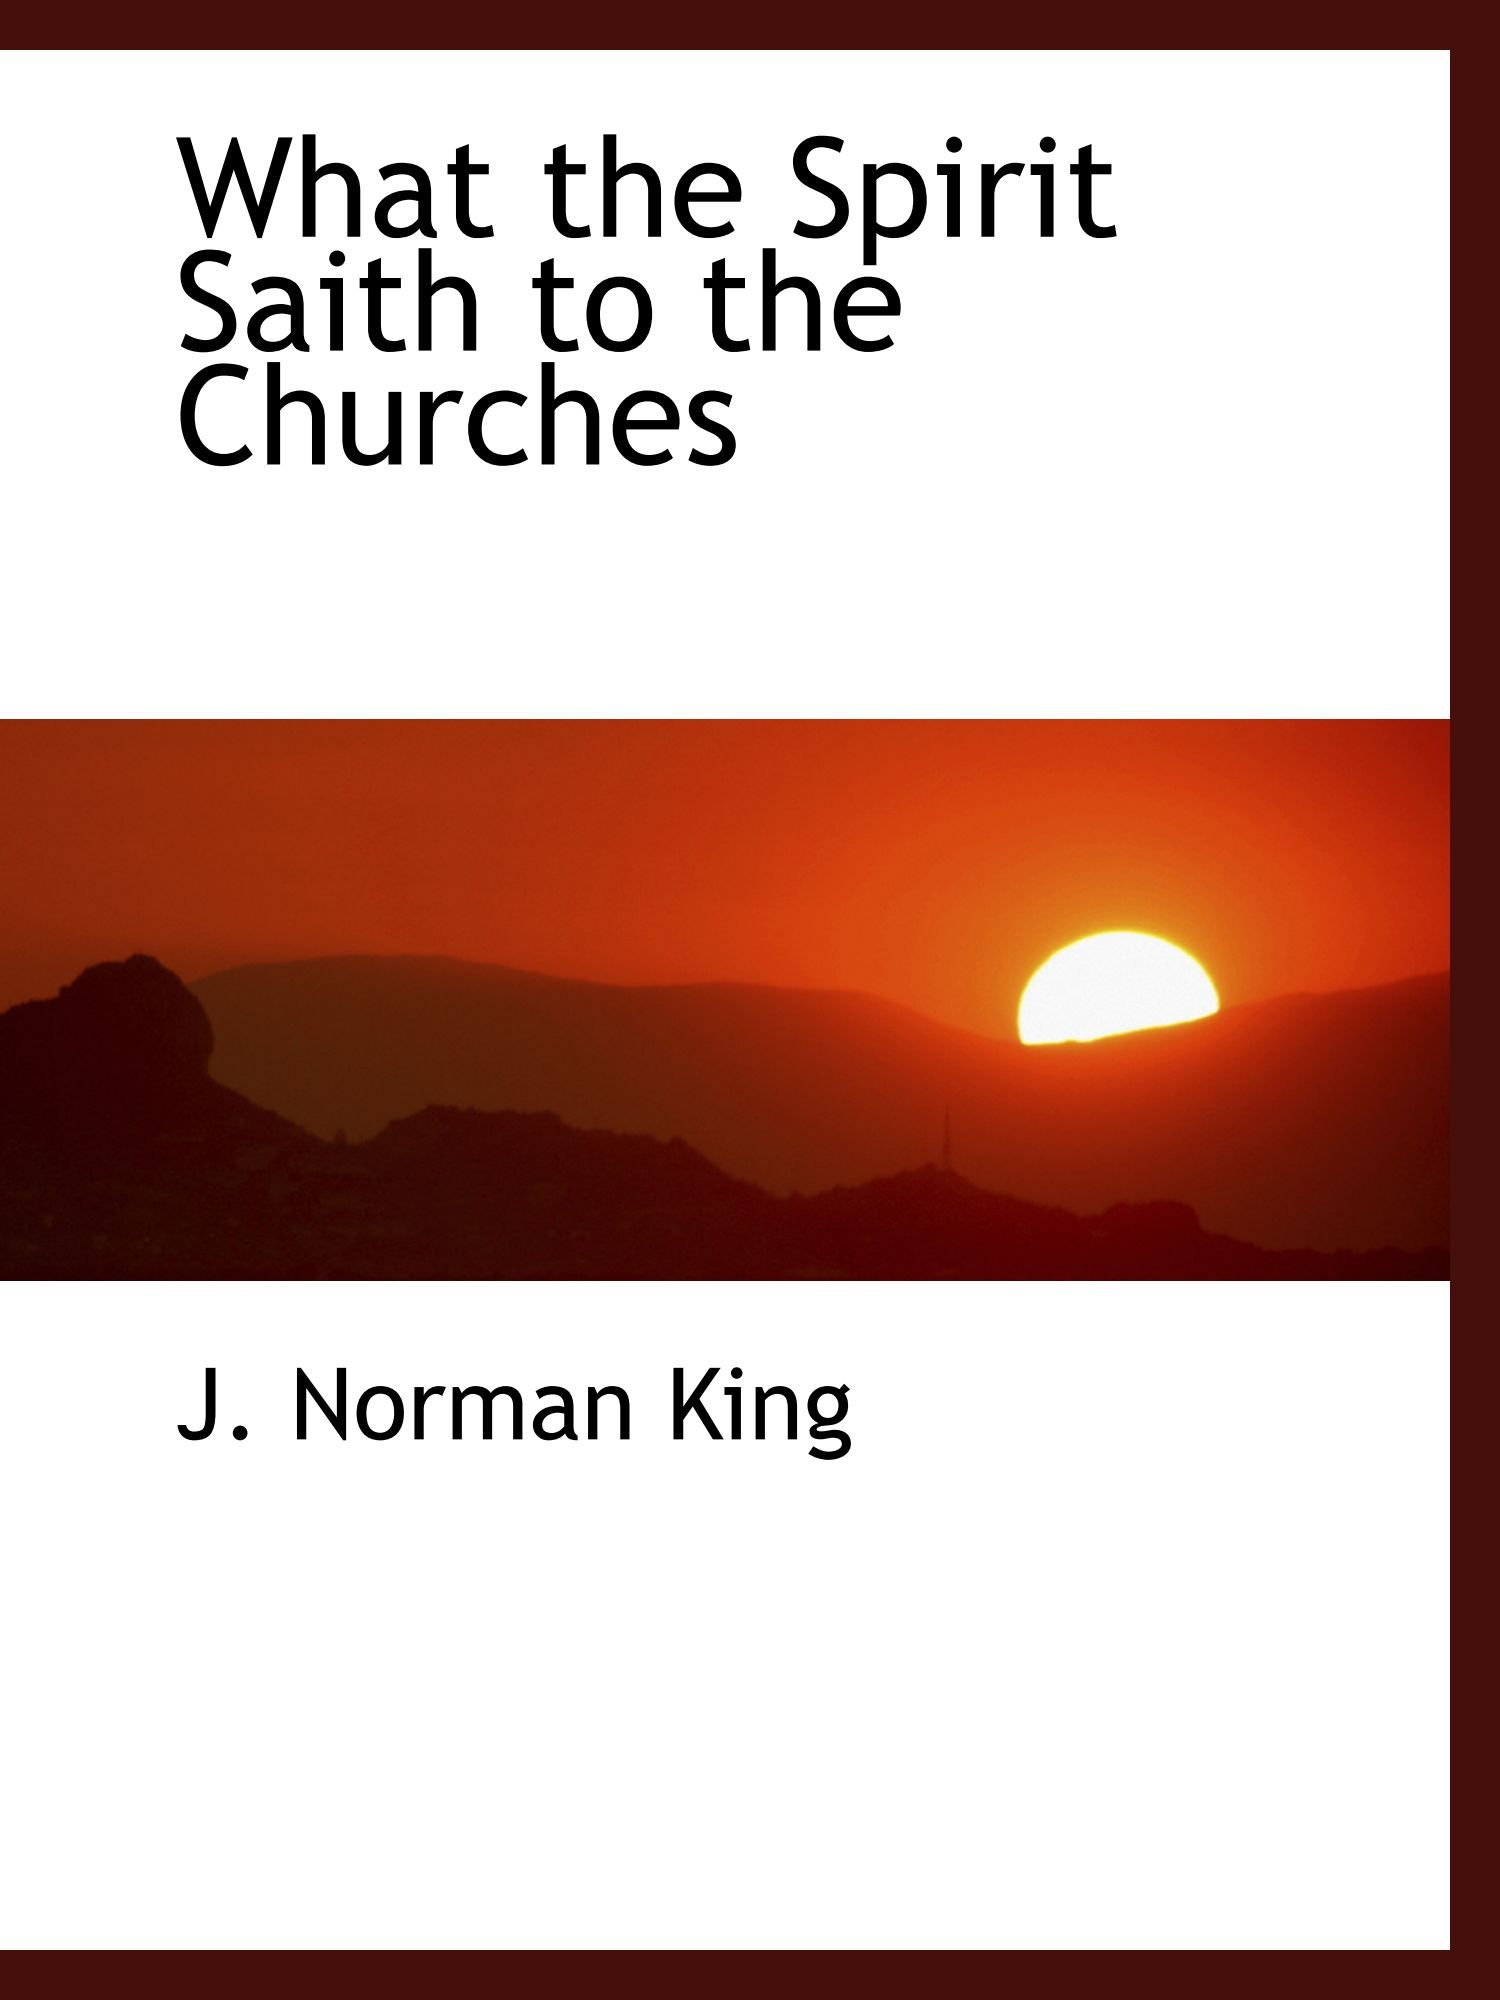 What the Spirit Saith to the Churches PDF